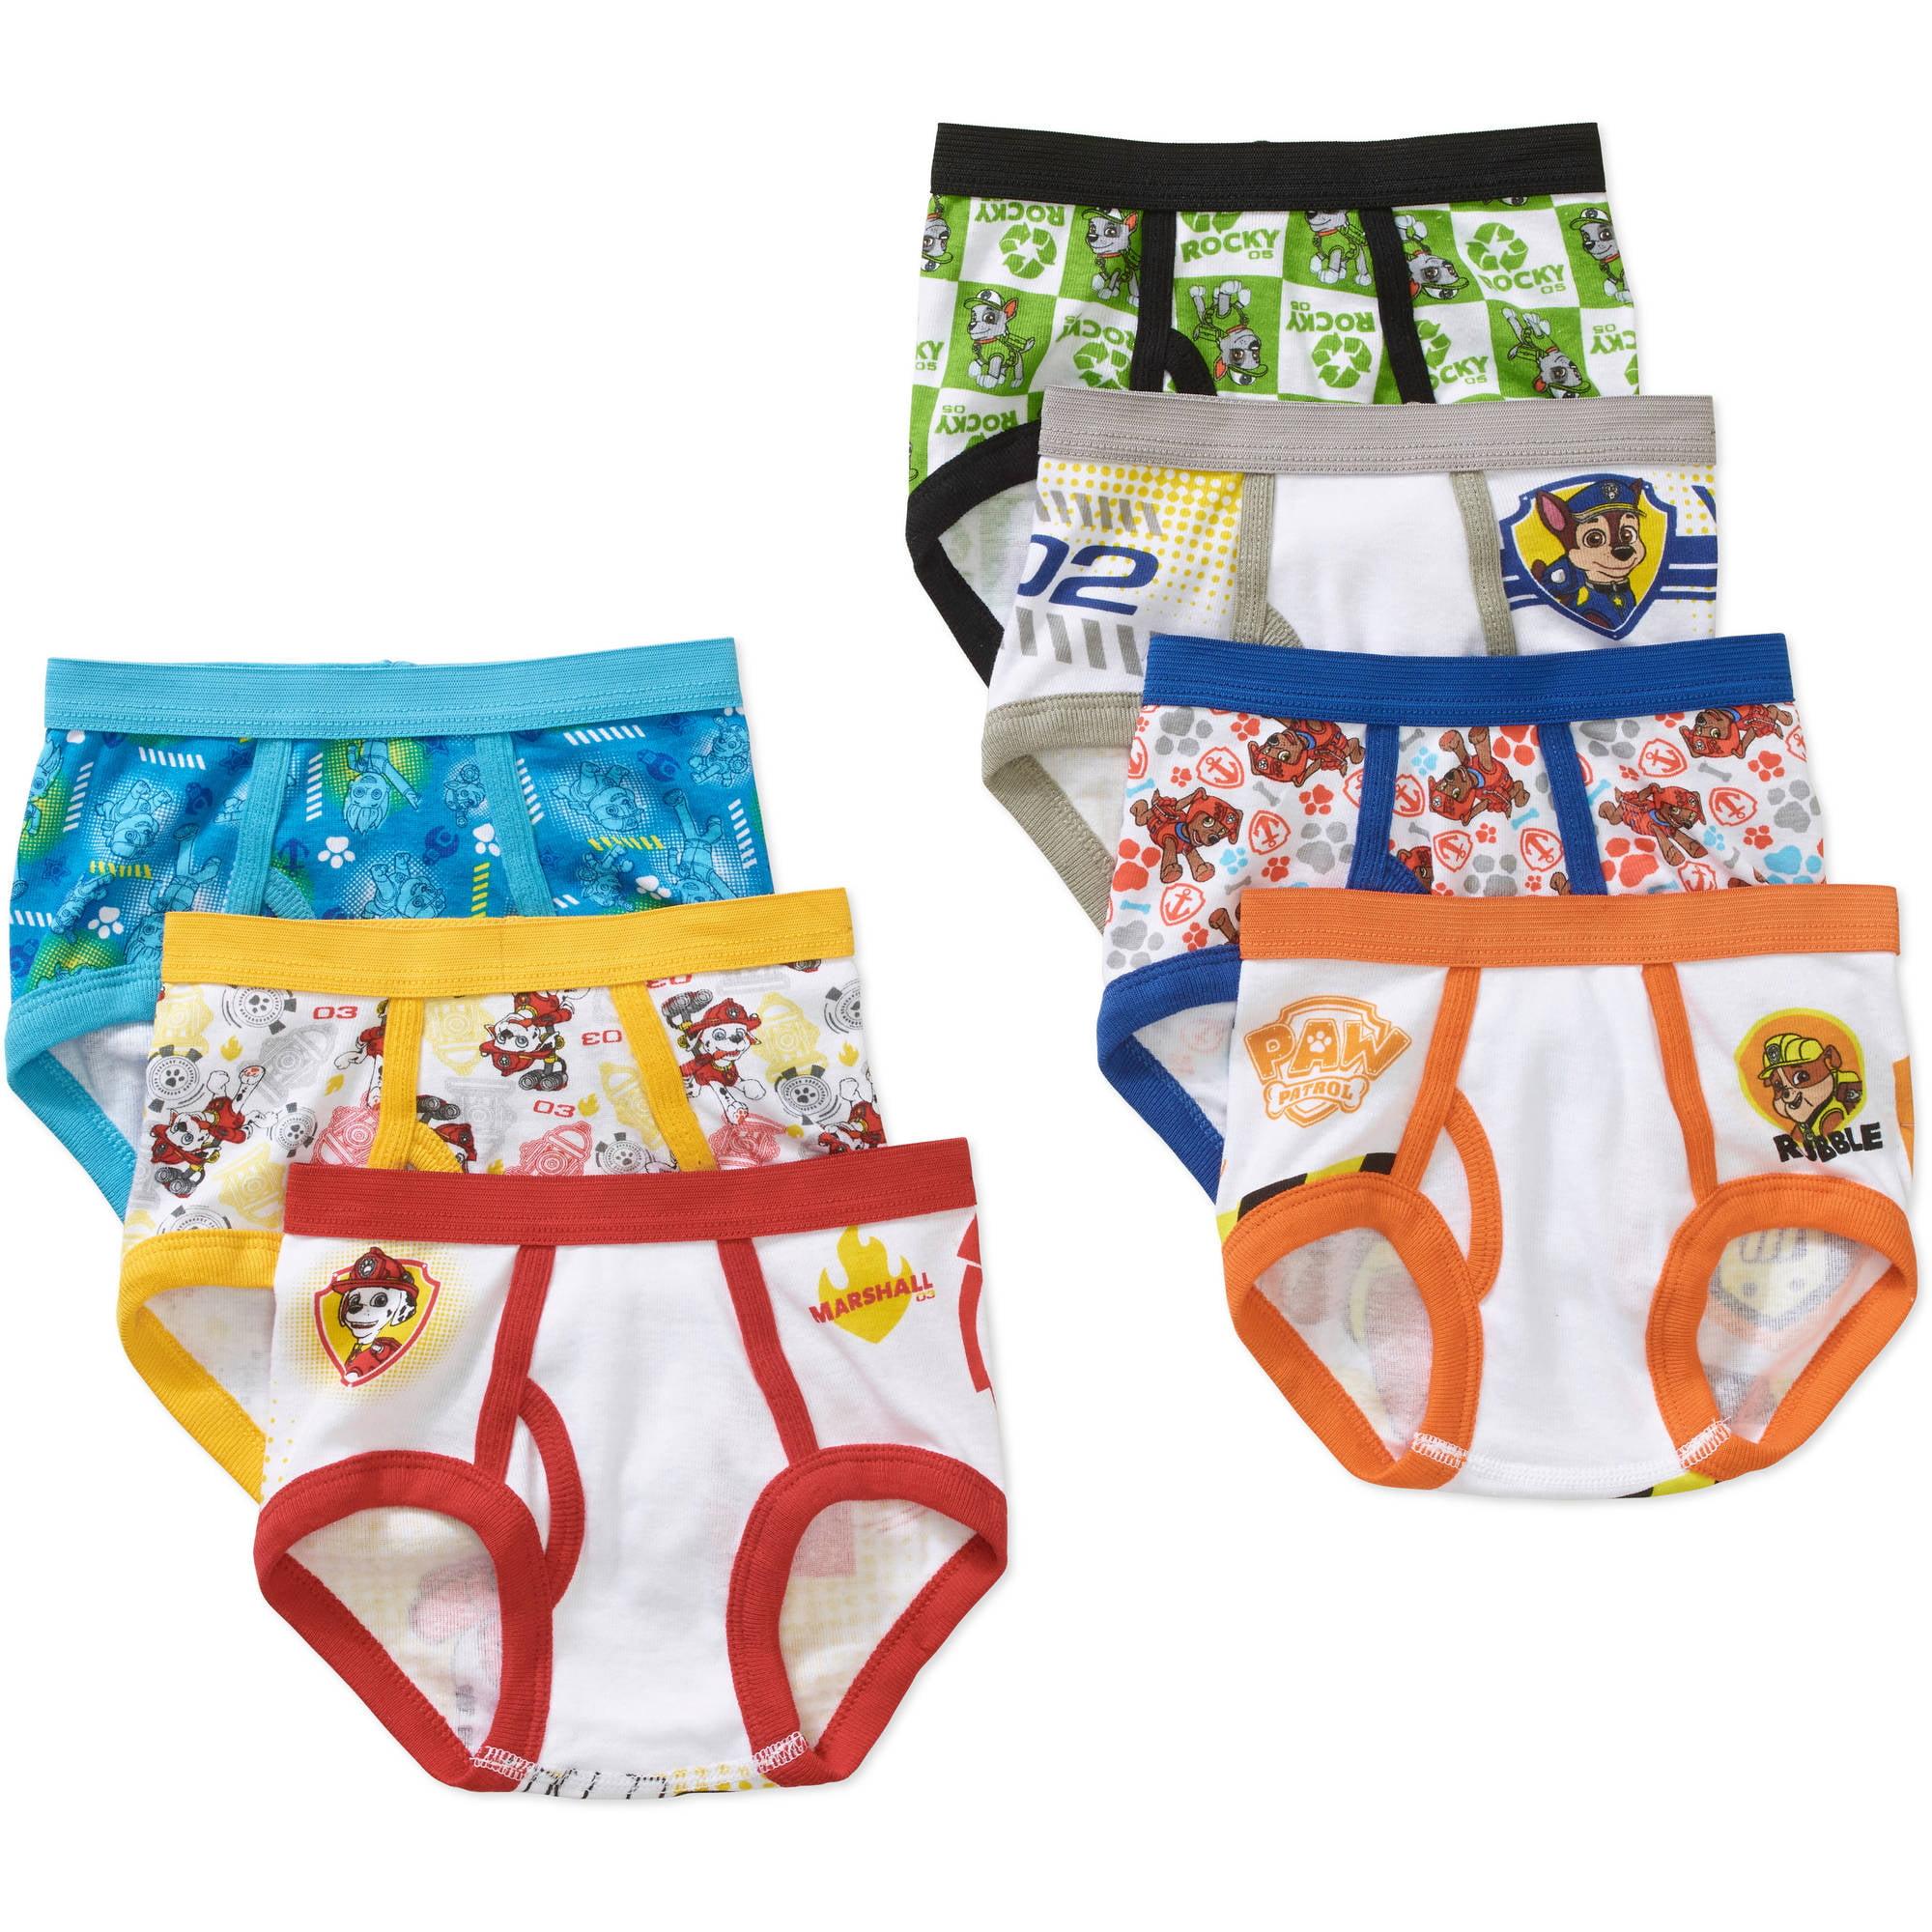 Nickelodeon Paw Patrol Toddler Boys Underwear, 7 Pack - Walmart.com